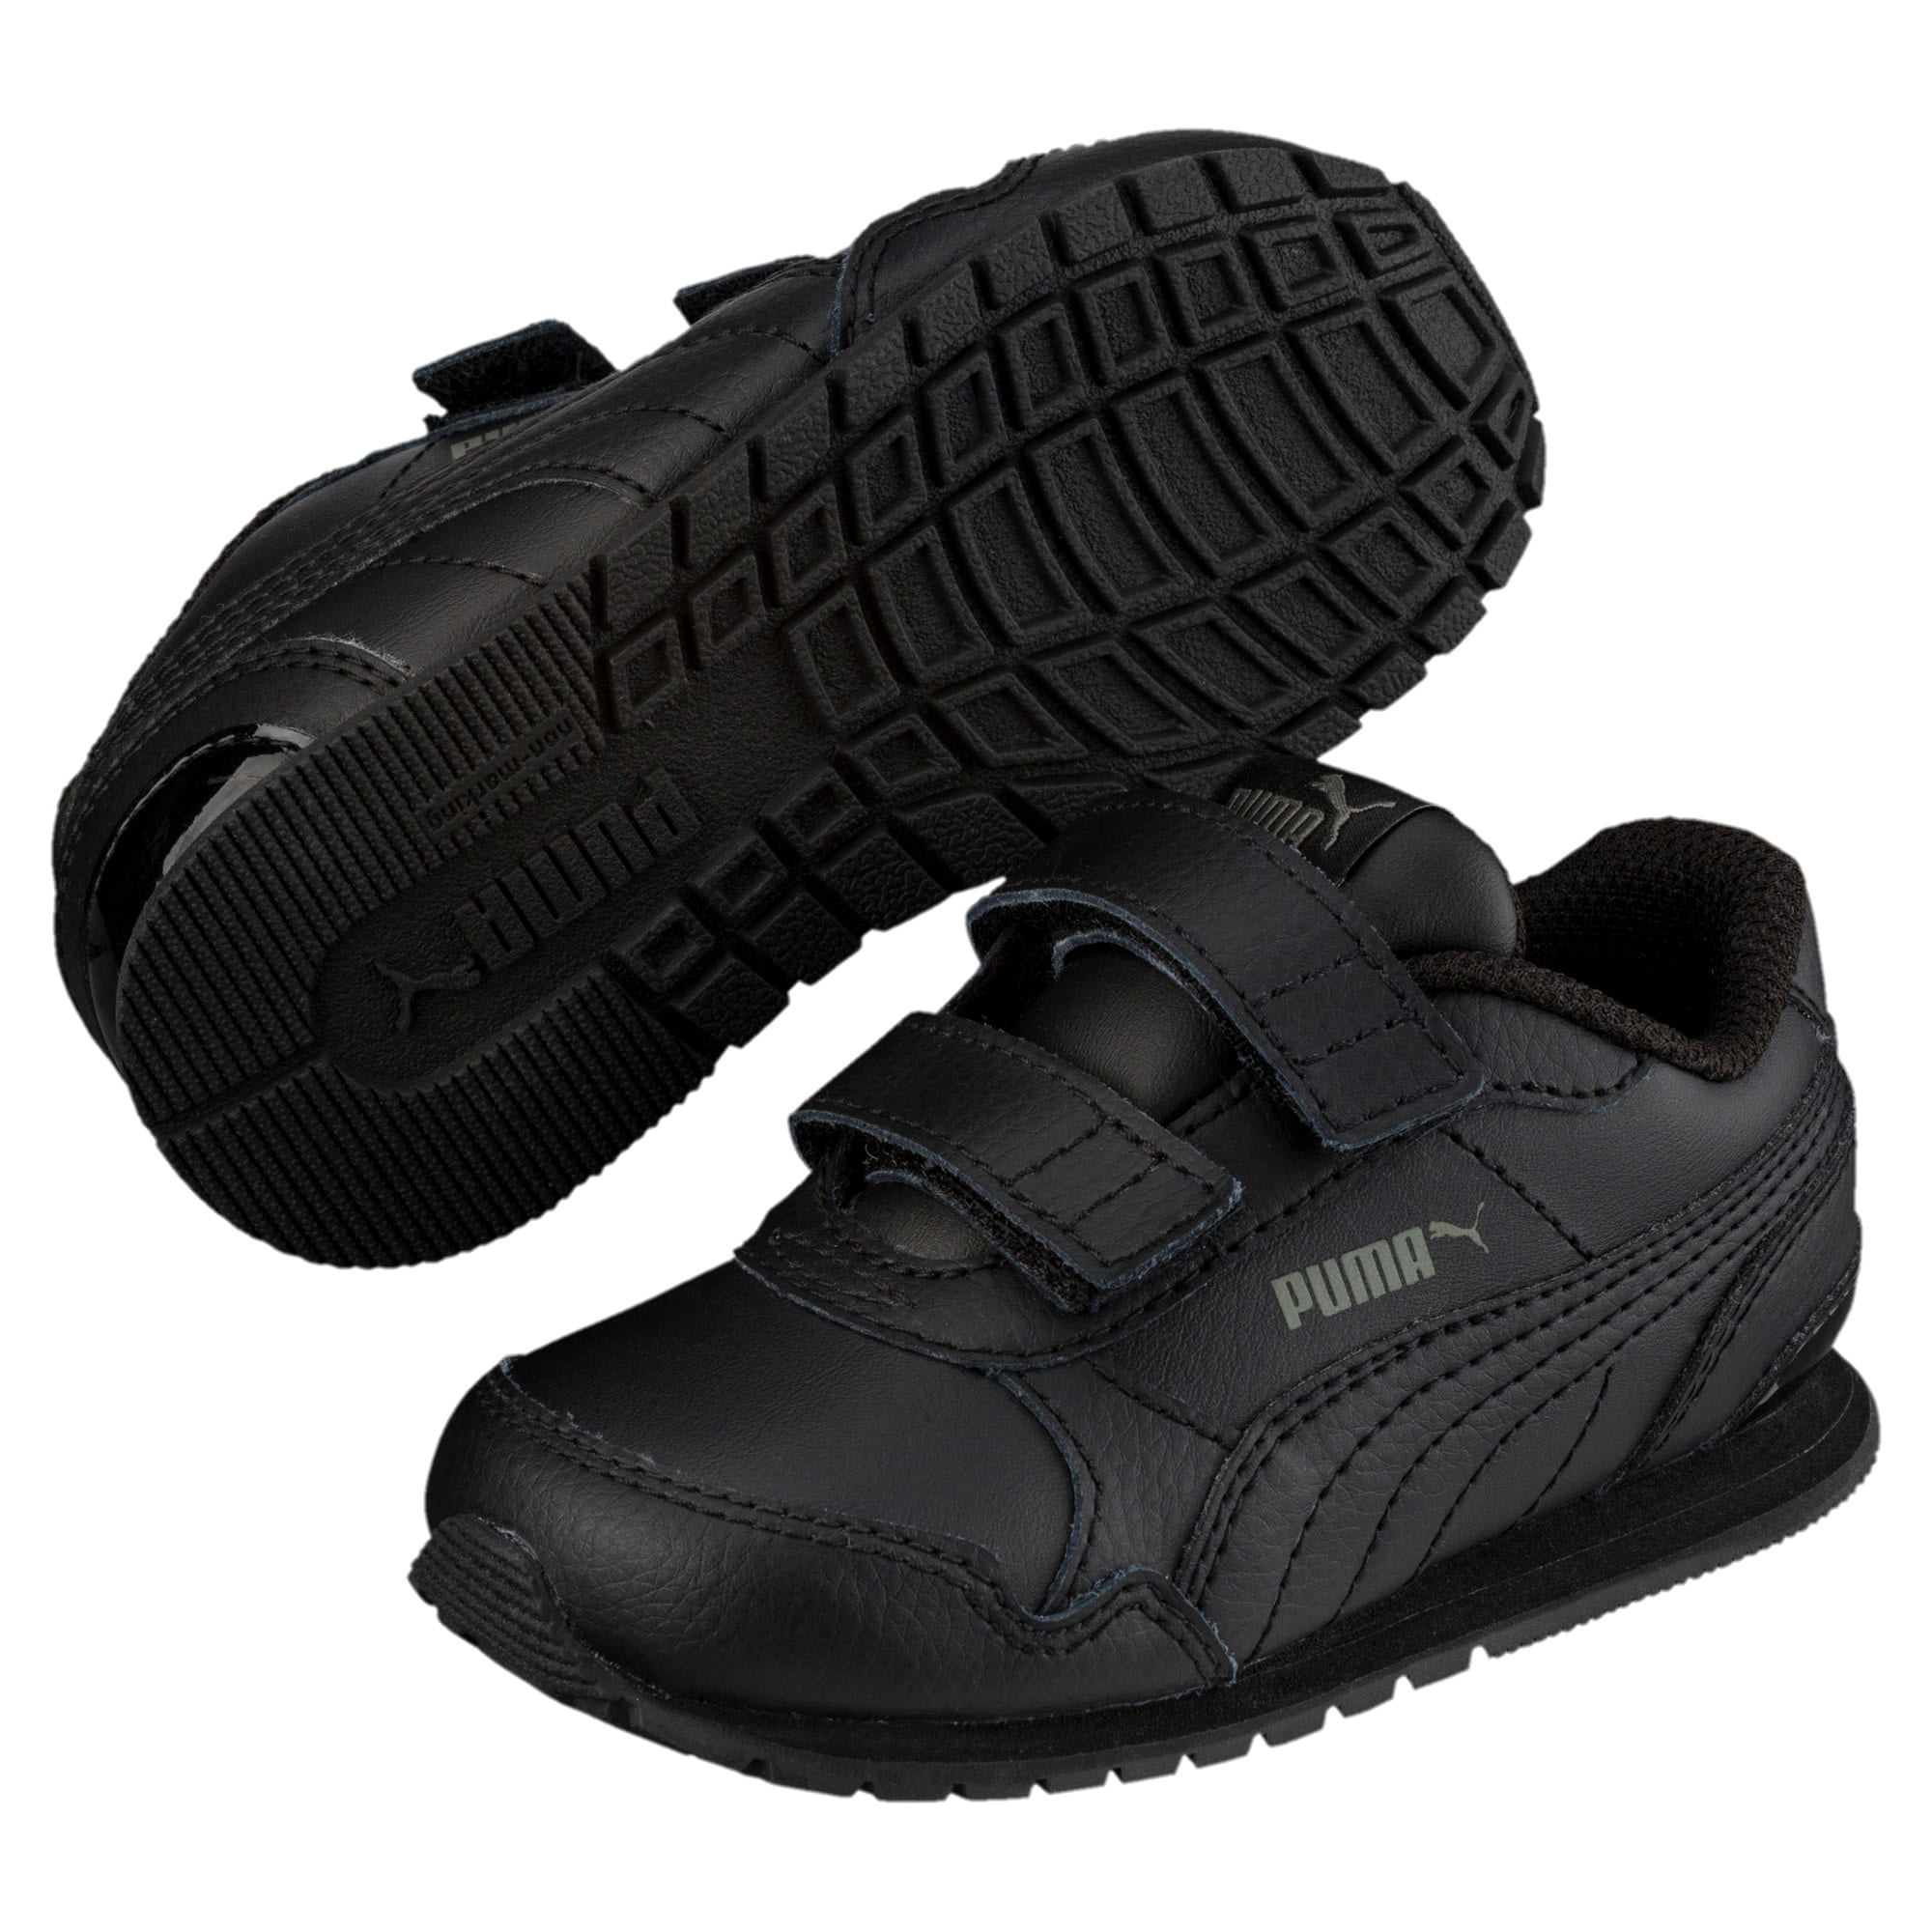 Thumbnail 2 of ST Runner v2 AC Shoes INF, Puma Black-Dark Shadow, medium